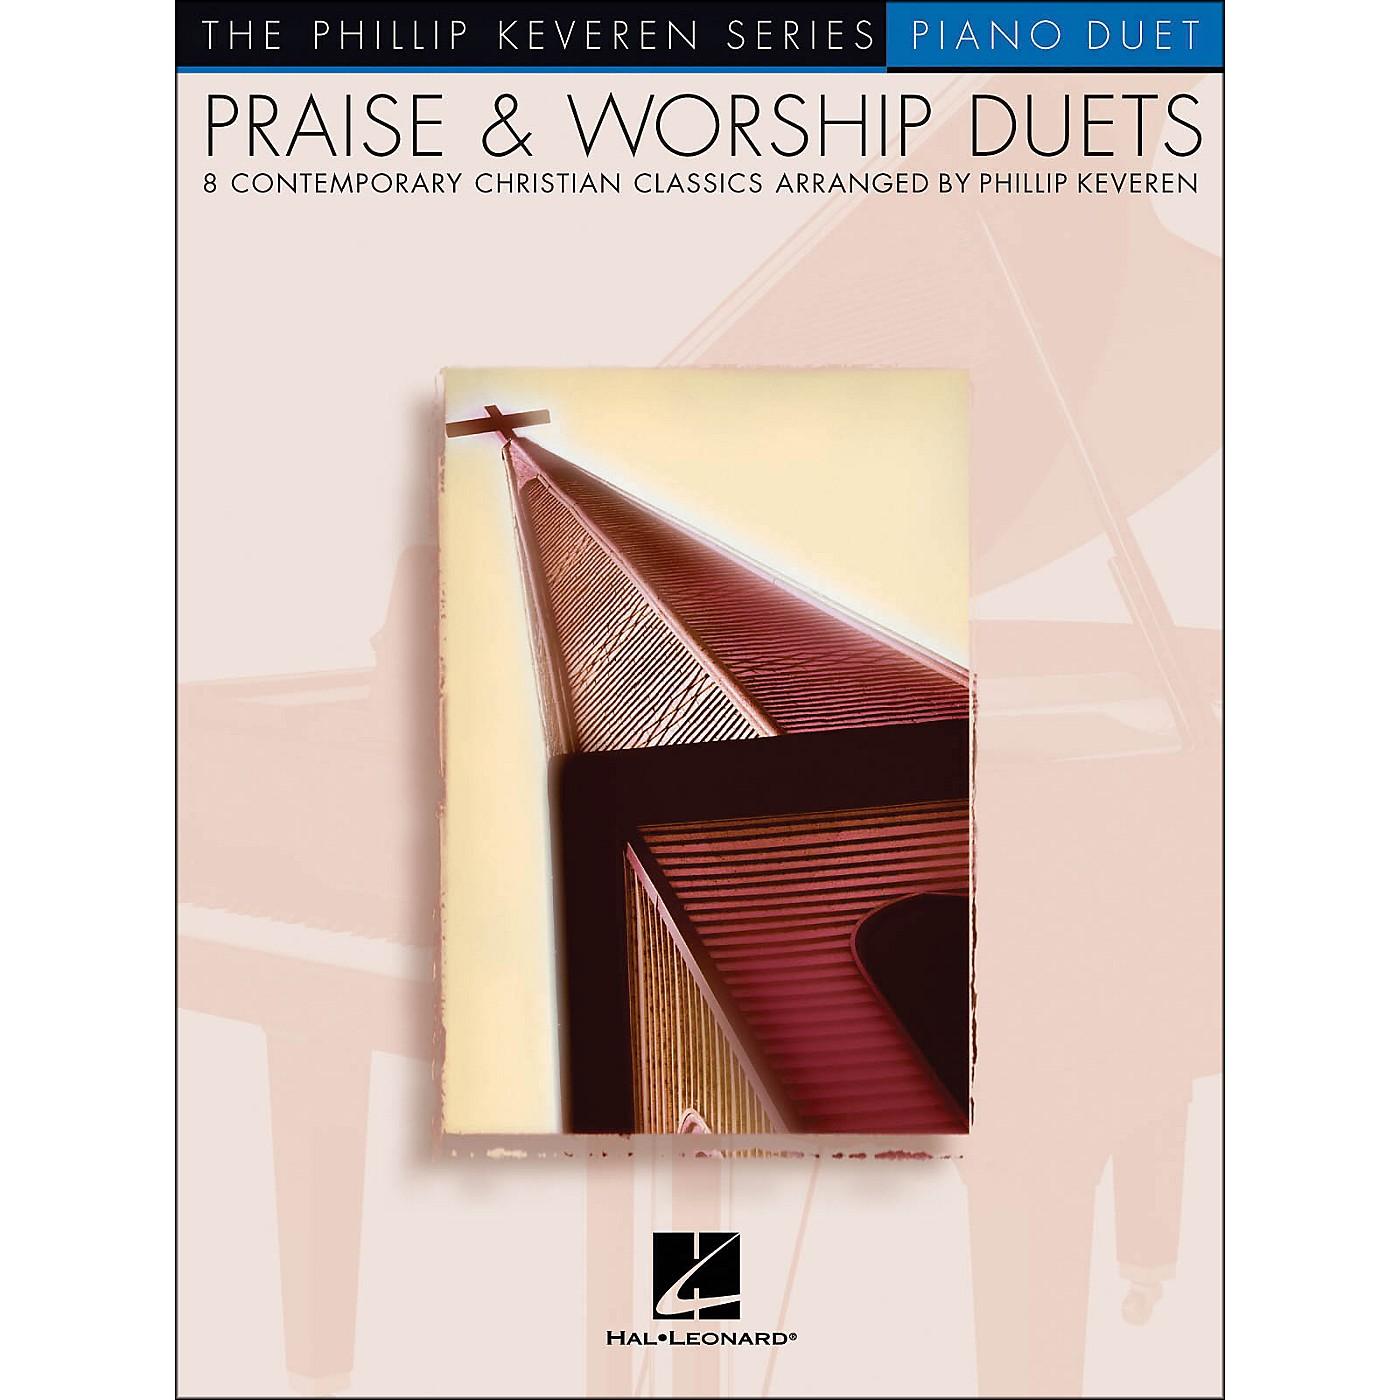 Hal Leonard Praise & Worship Duets Phillip Keveren Series Piano Duet thumbnail